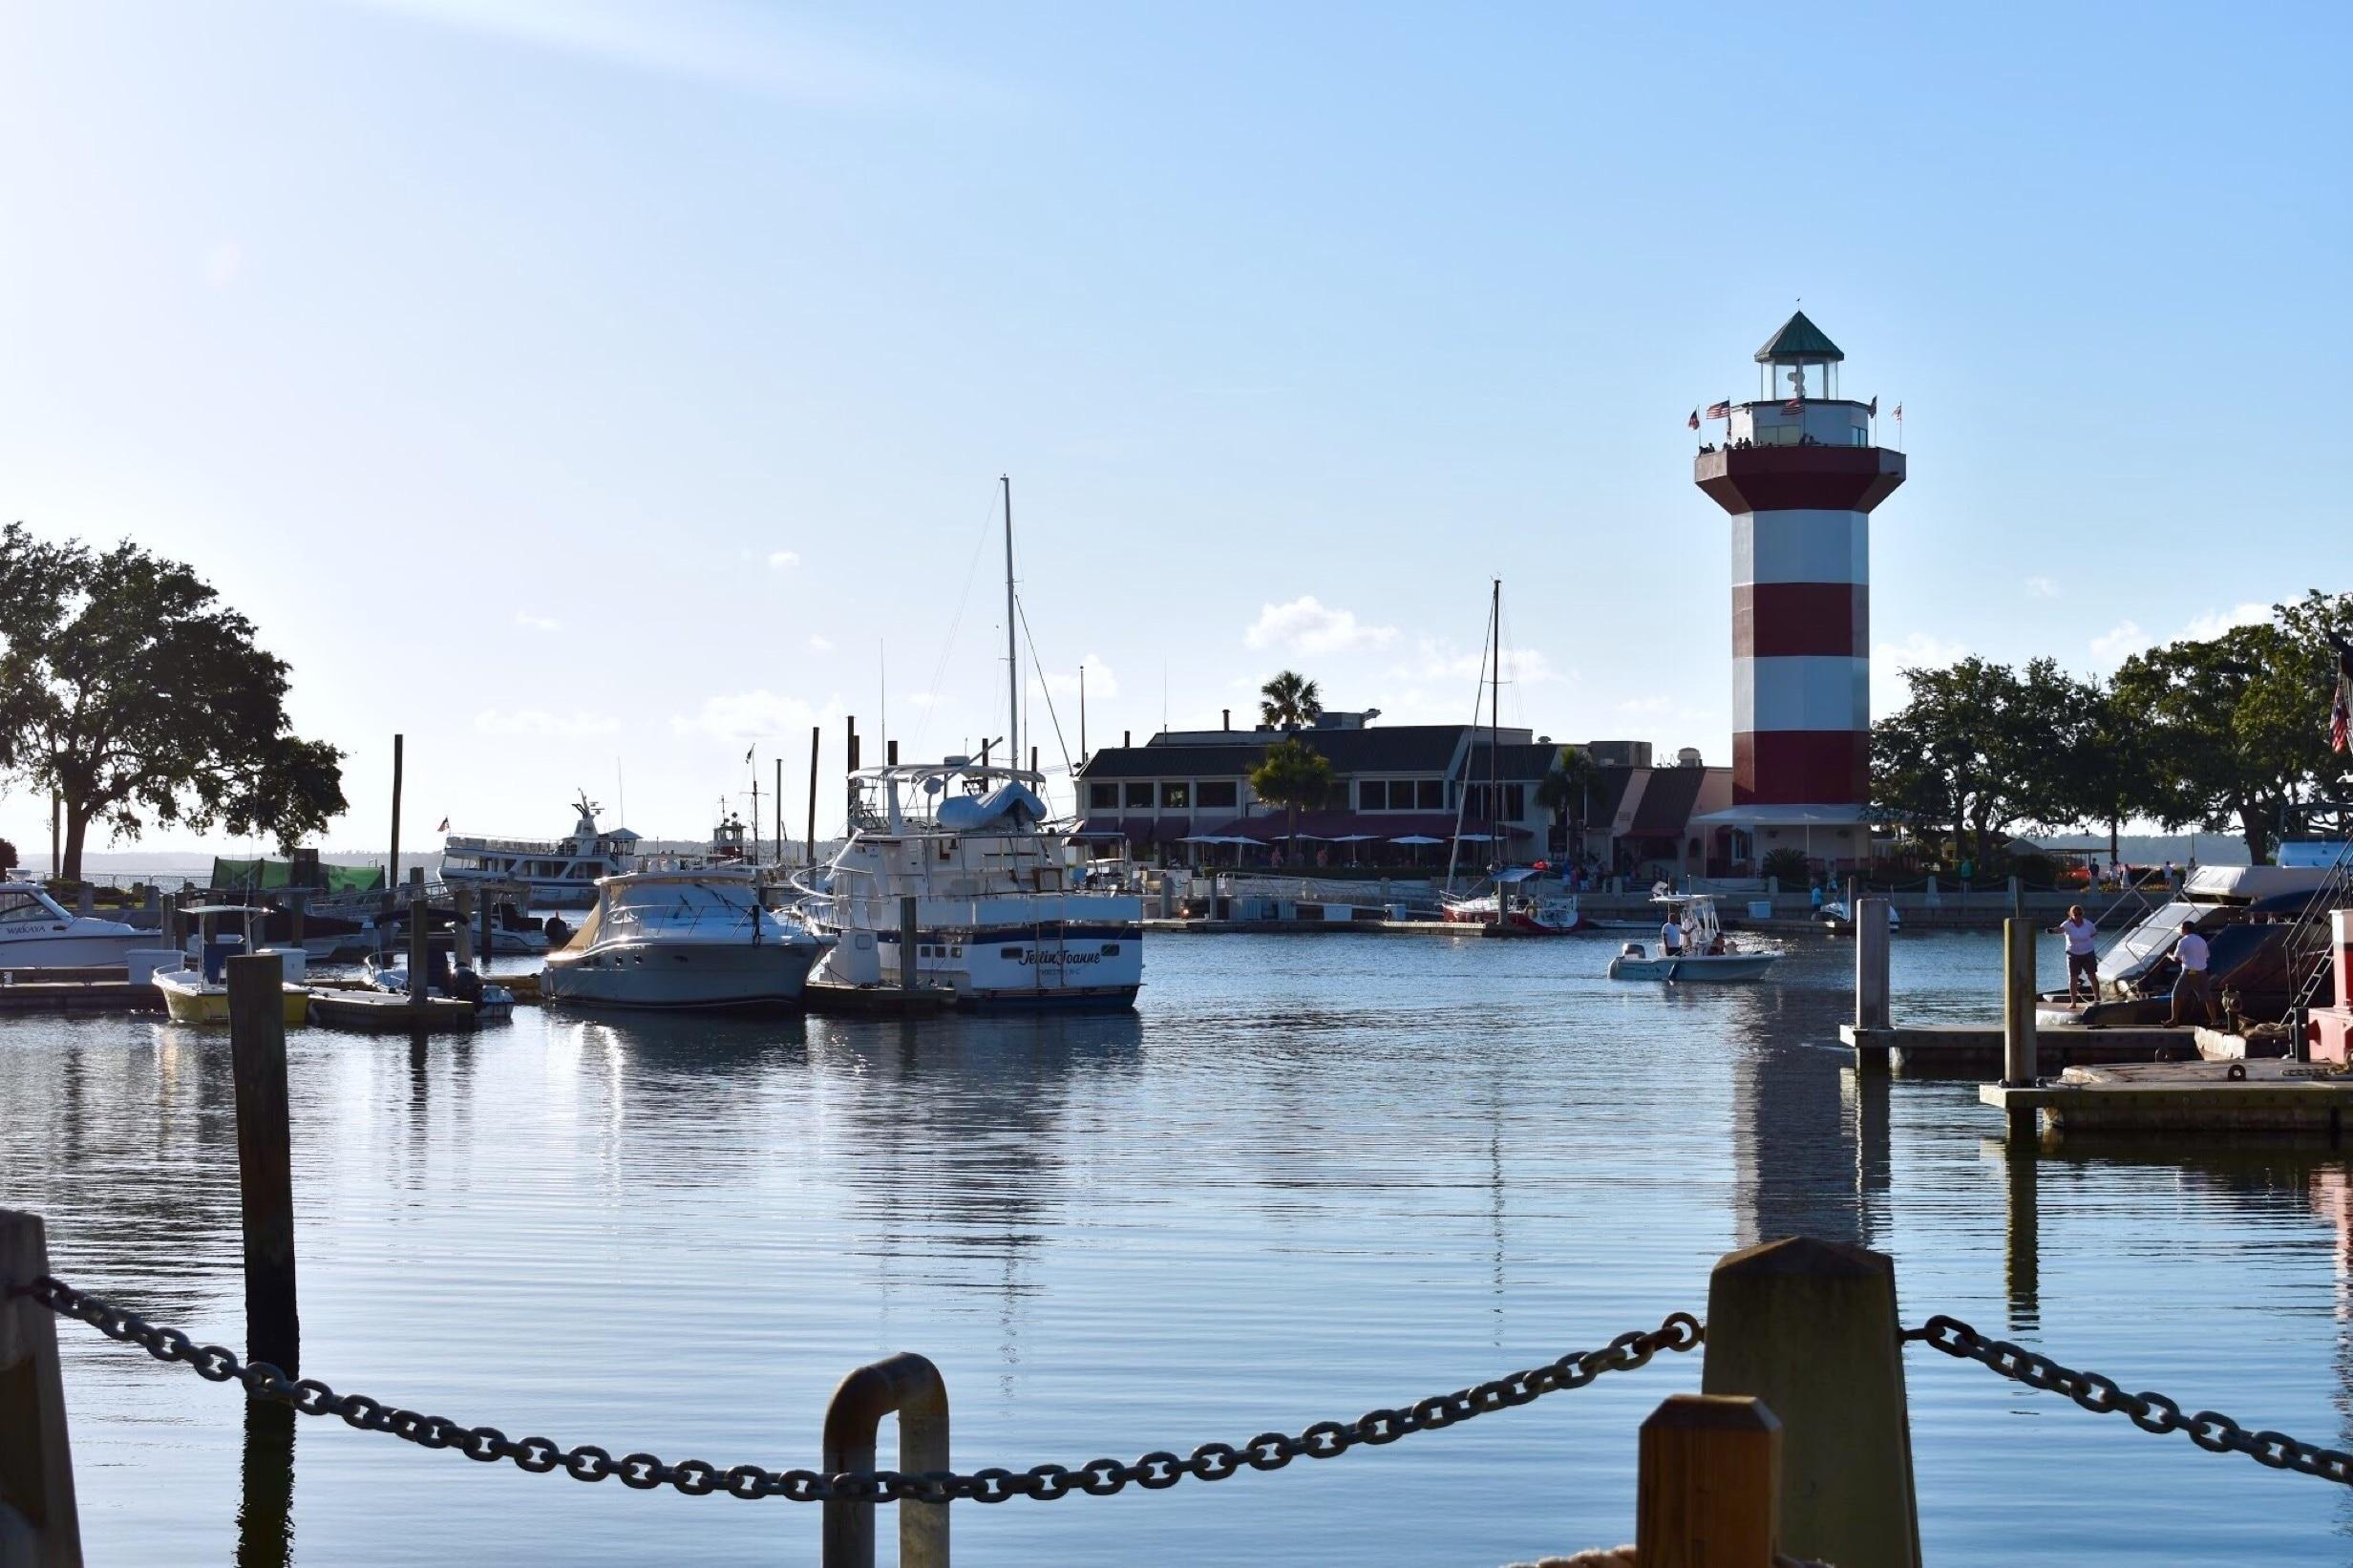 Harbour Town, Hilton Head, South Carolina, United States of America